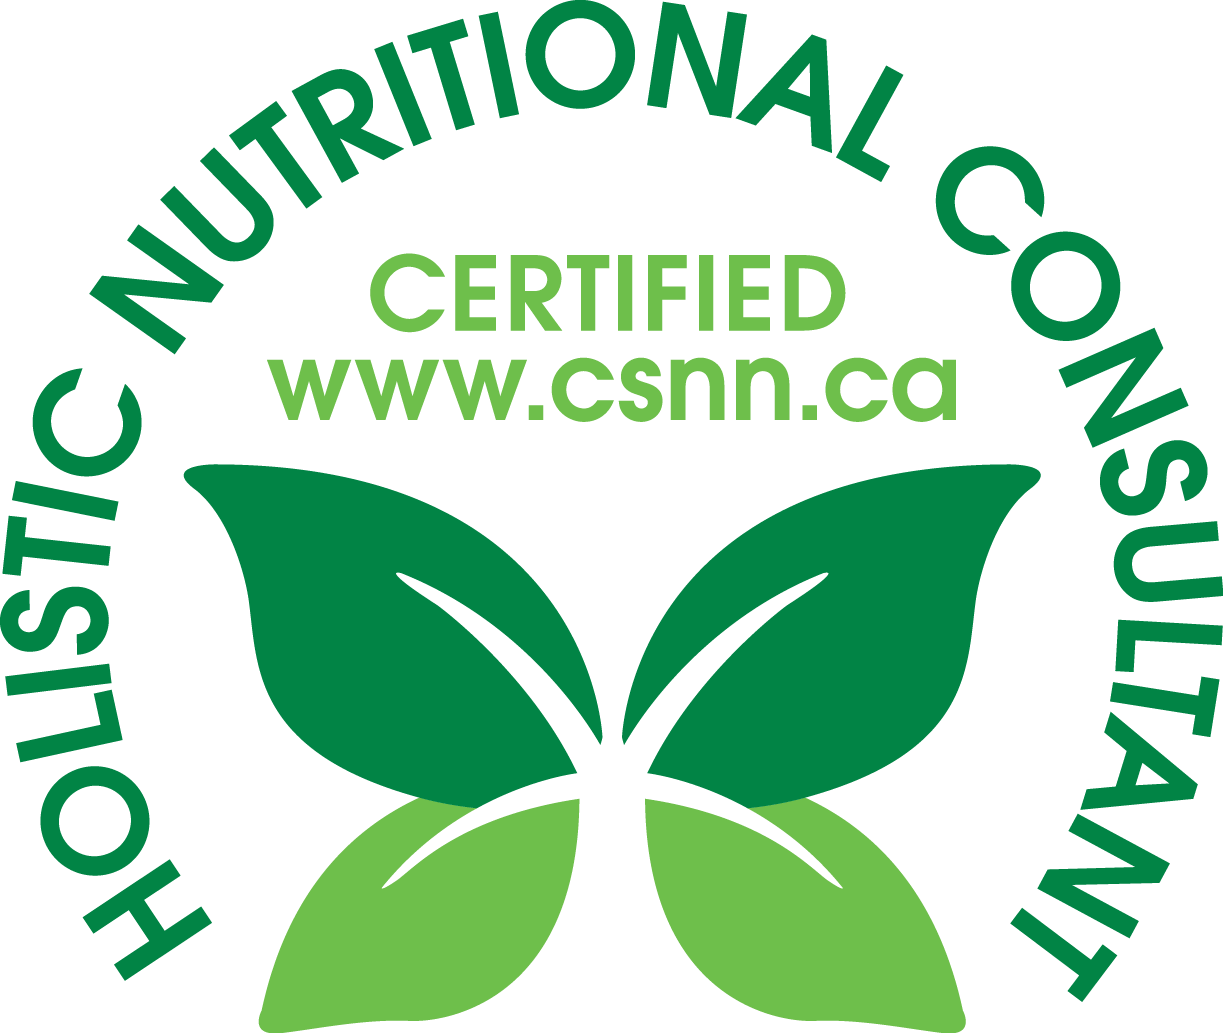 Certified Symbol